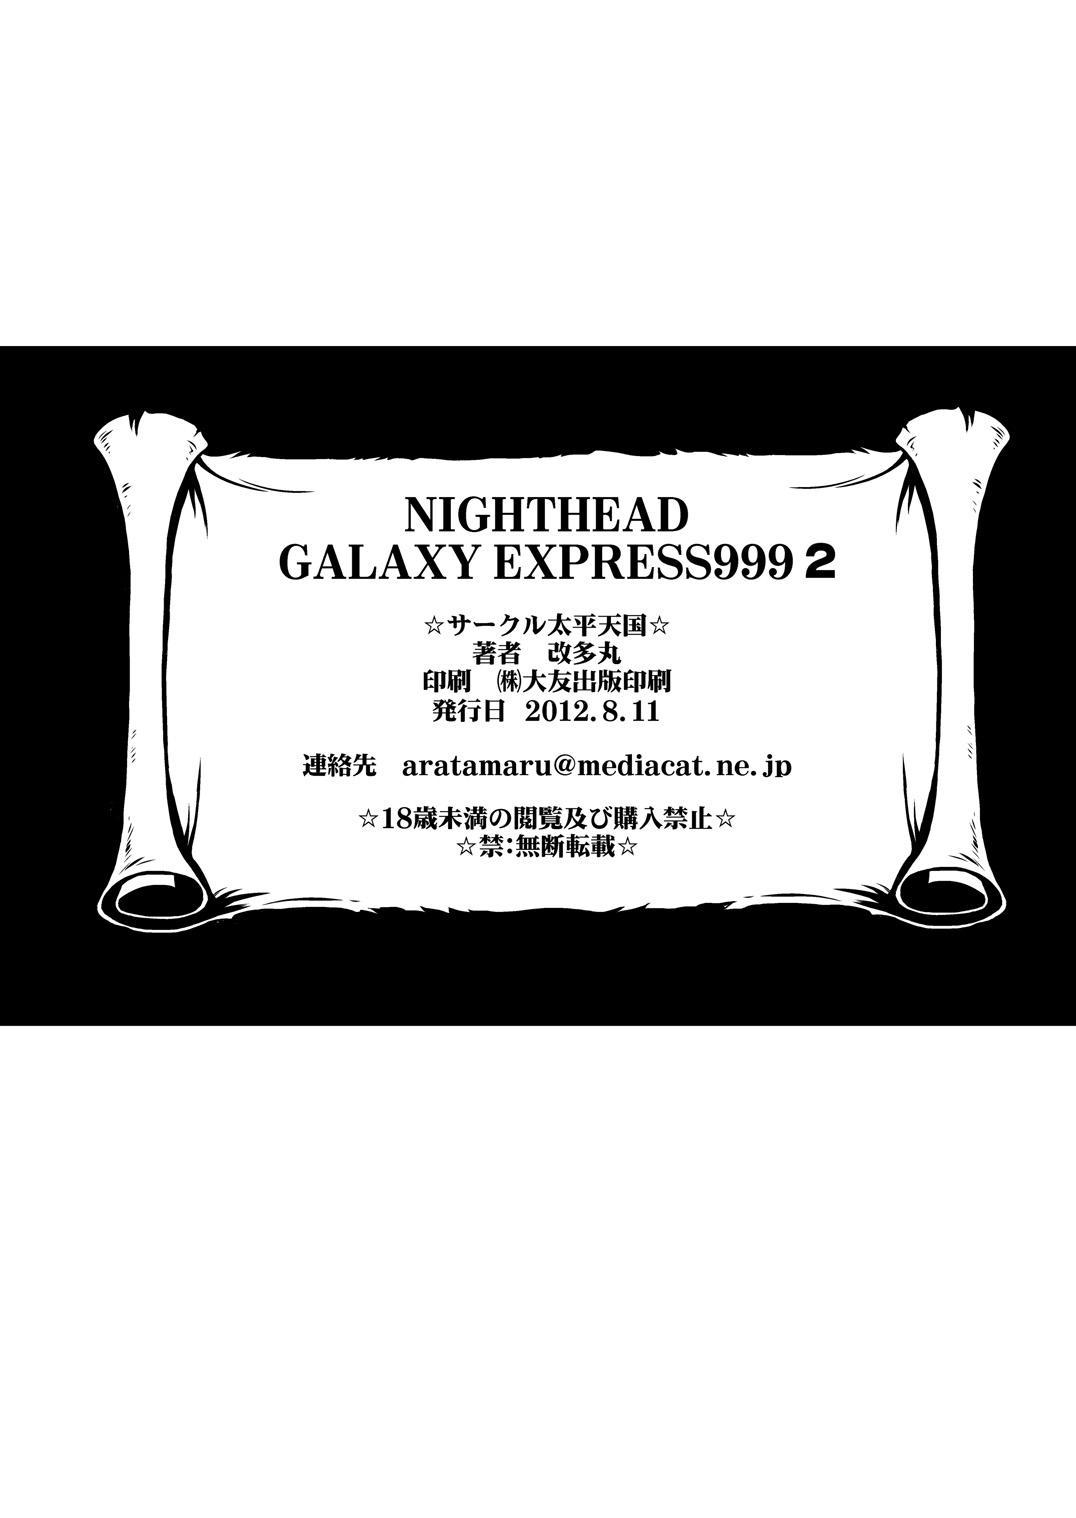 NIGHTHEAD GALAXY EXPRESS 999 2 22